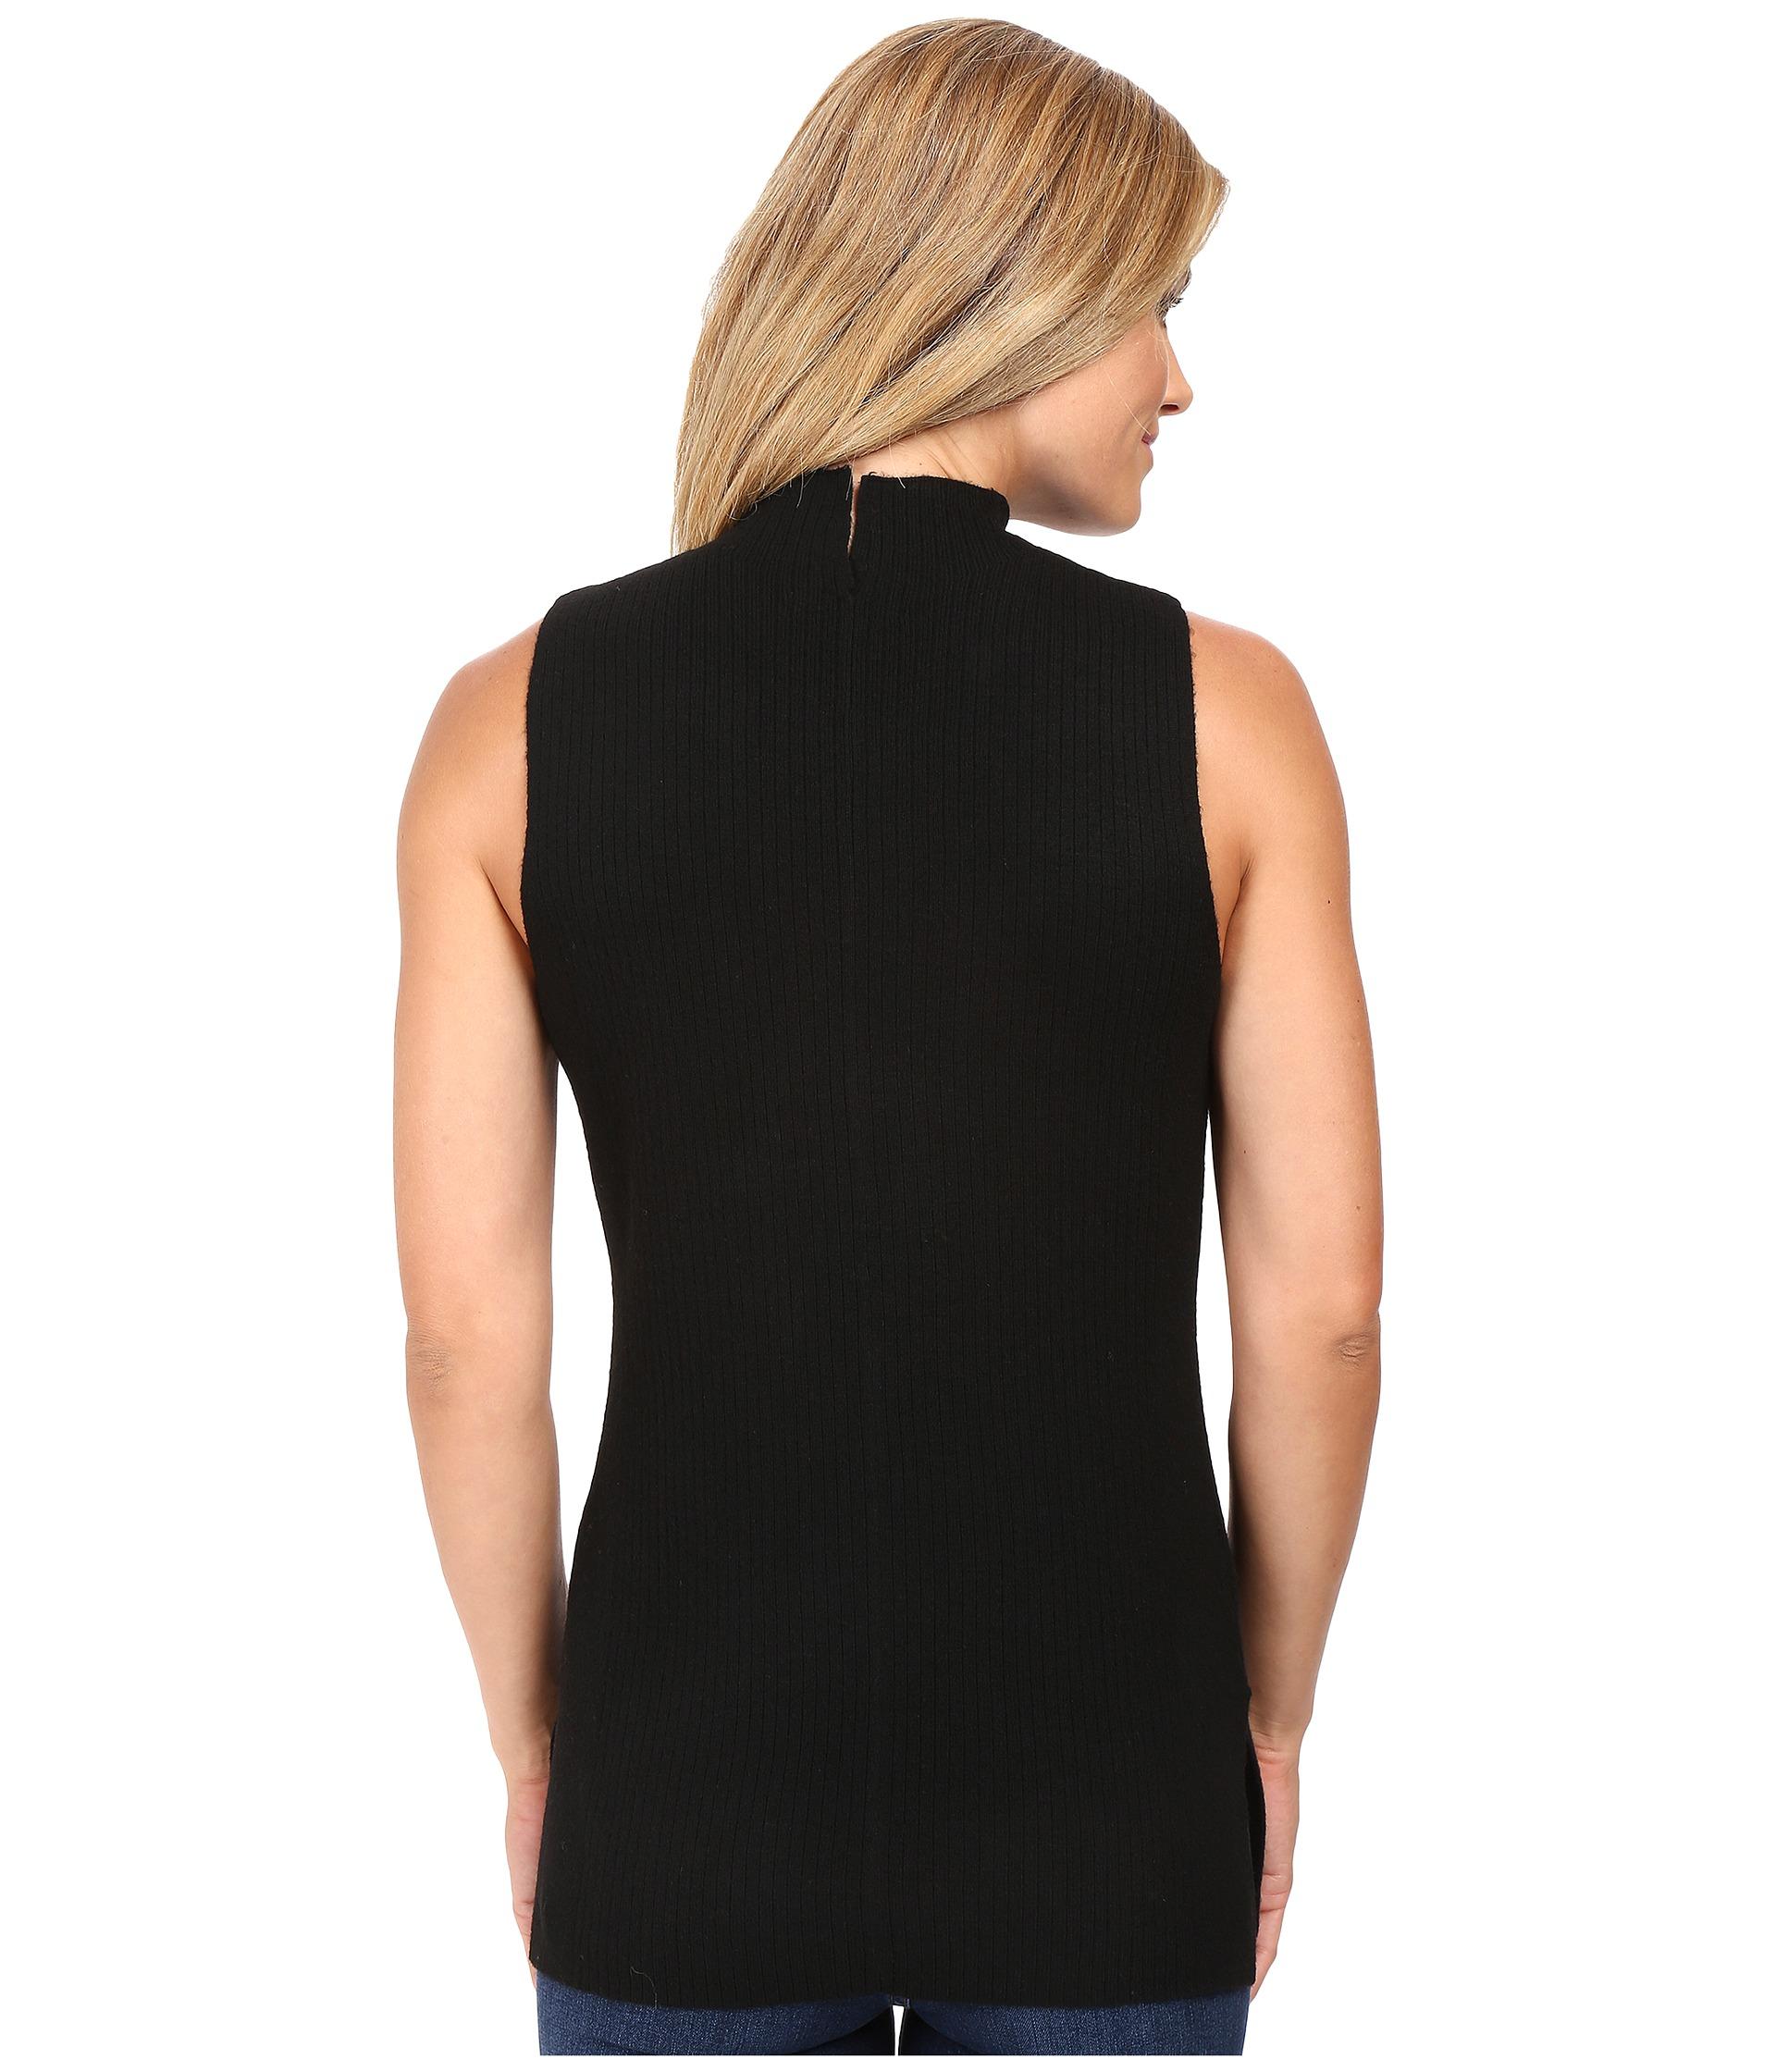 calvin klein sleeveless mock neck sweater black zappos. Black Bedroom Furniture Sets. Home Design Ideas